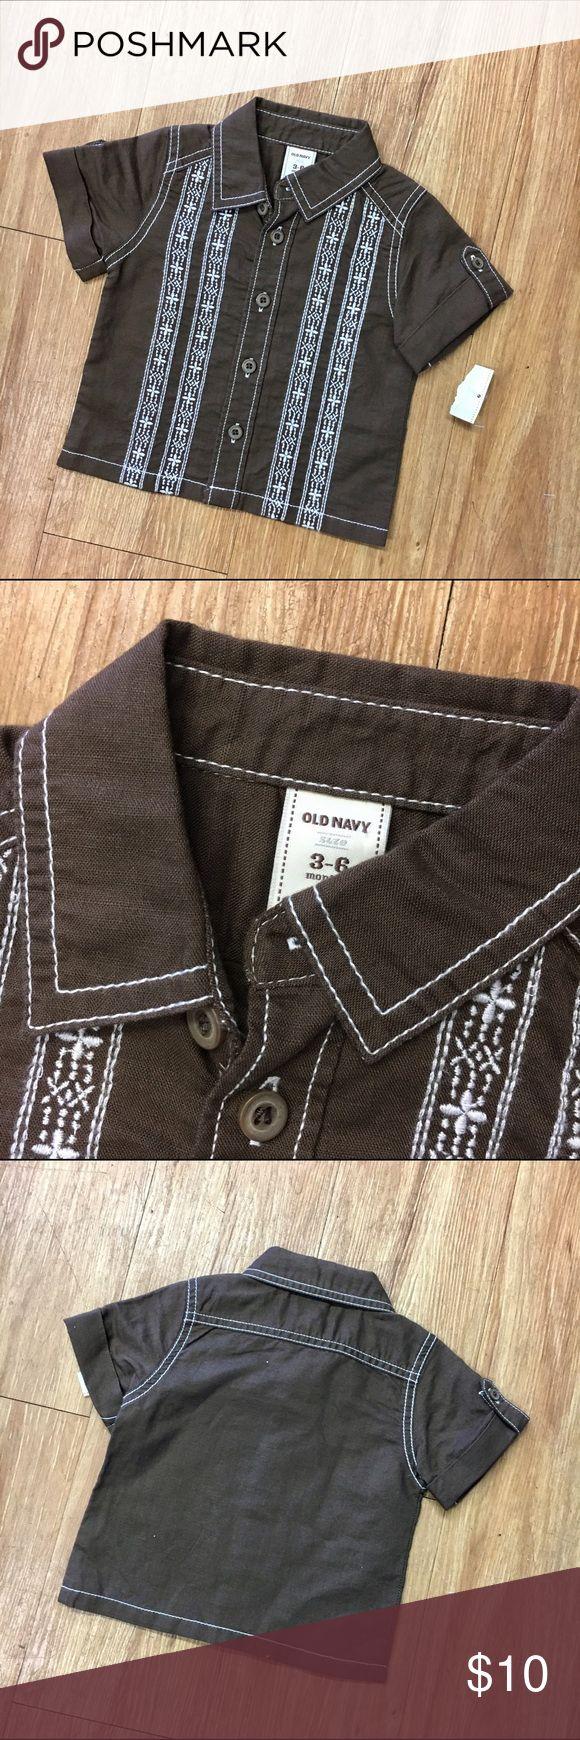 Old Navy NEW NWT Brown White Cubavera Shirt 3-6 Mo Old Navy NEW NWT Brown White Cubavera Shirt 3-6 Mo  Super cute buttonfront short sleeve shirt from Old Navy.  Cubavera style.  55% linen, 45% cotton.  #new #brown #shirt #nwt #cubavera #embroidered #buttonfront #dressshirt #casual #beachwear #tothebeach #letsgotothebeach Old Navy Shirts & Tops Button Down Shirts